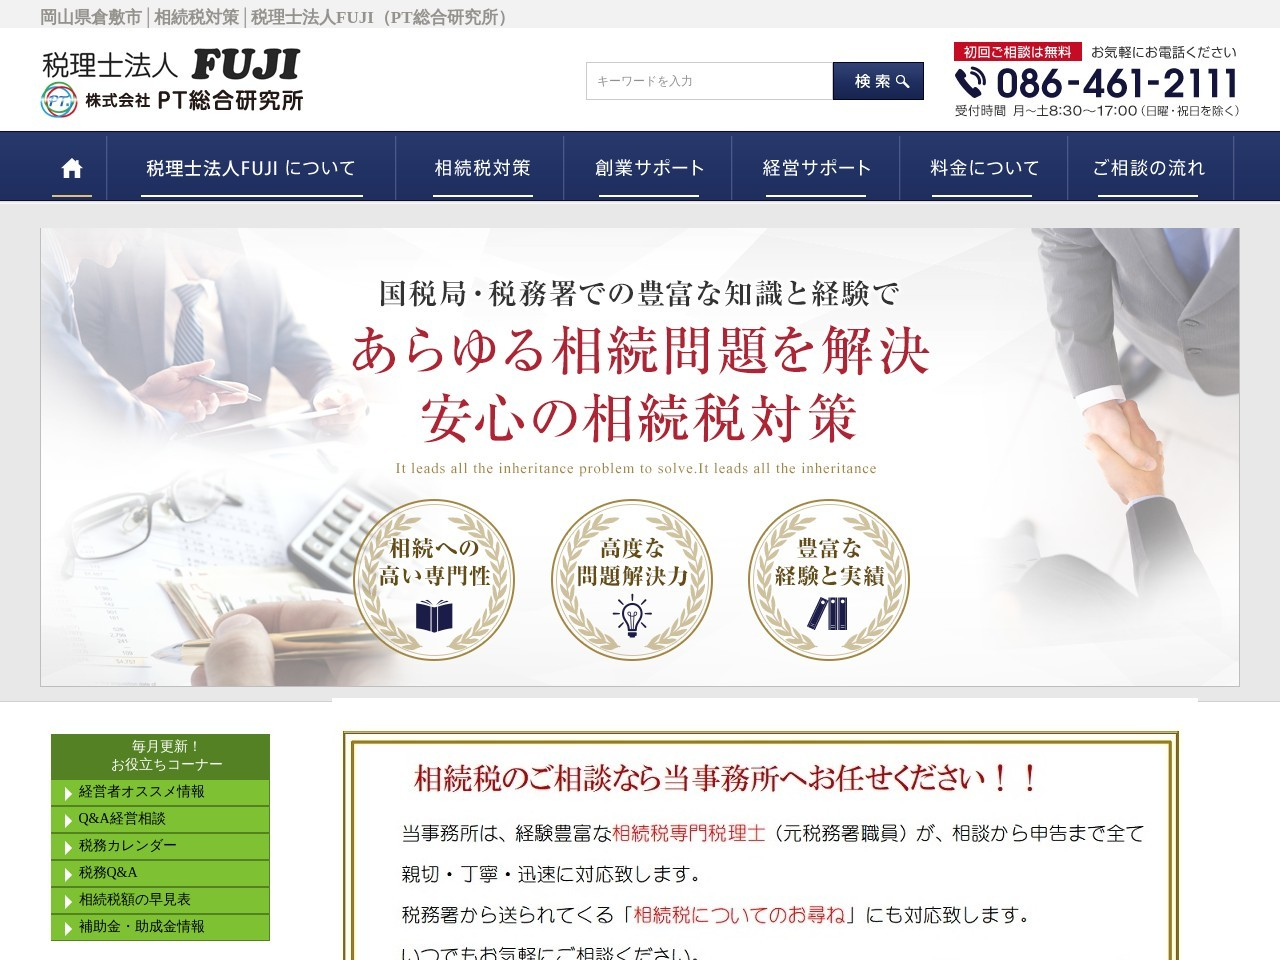 FUJI(税理士法人)